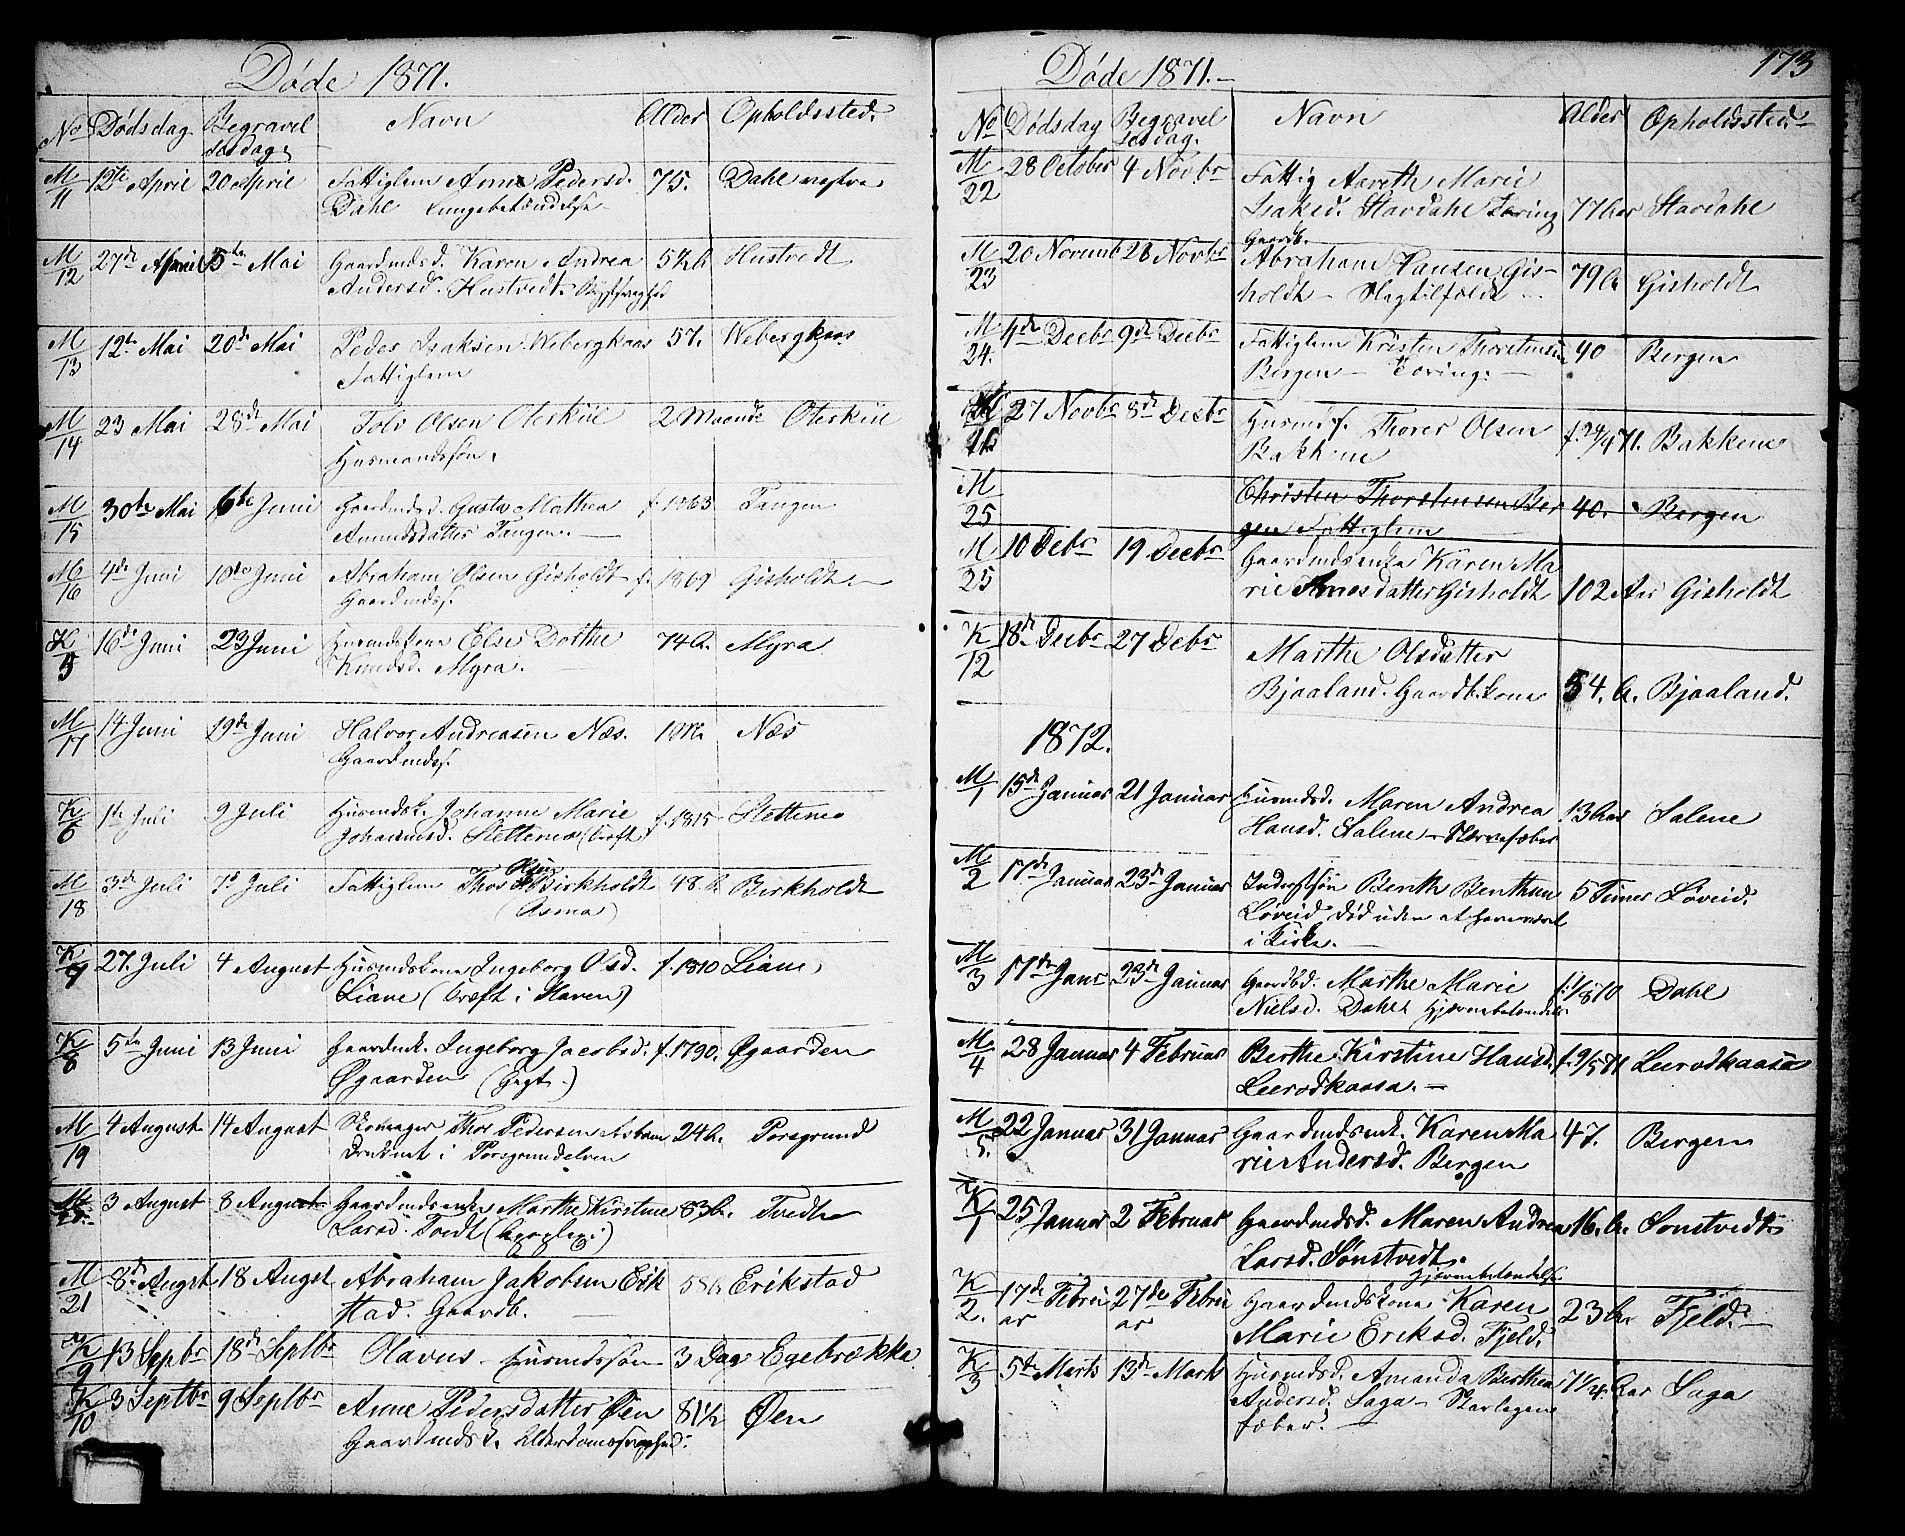 SAKO, Solum kirkebøker, G/Gb/L0002: Klokkerbok nr. II 2, 1859-1879, s. 173